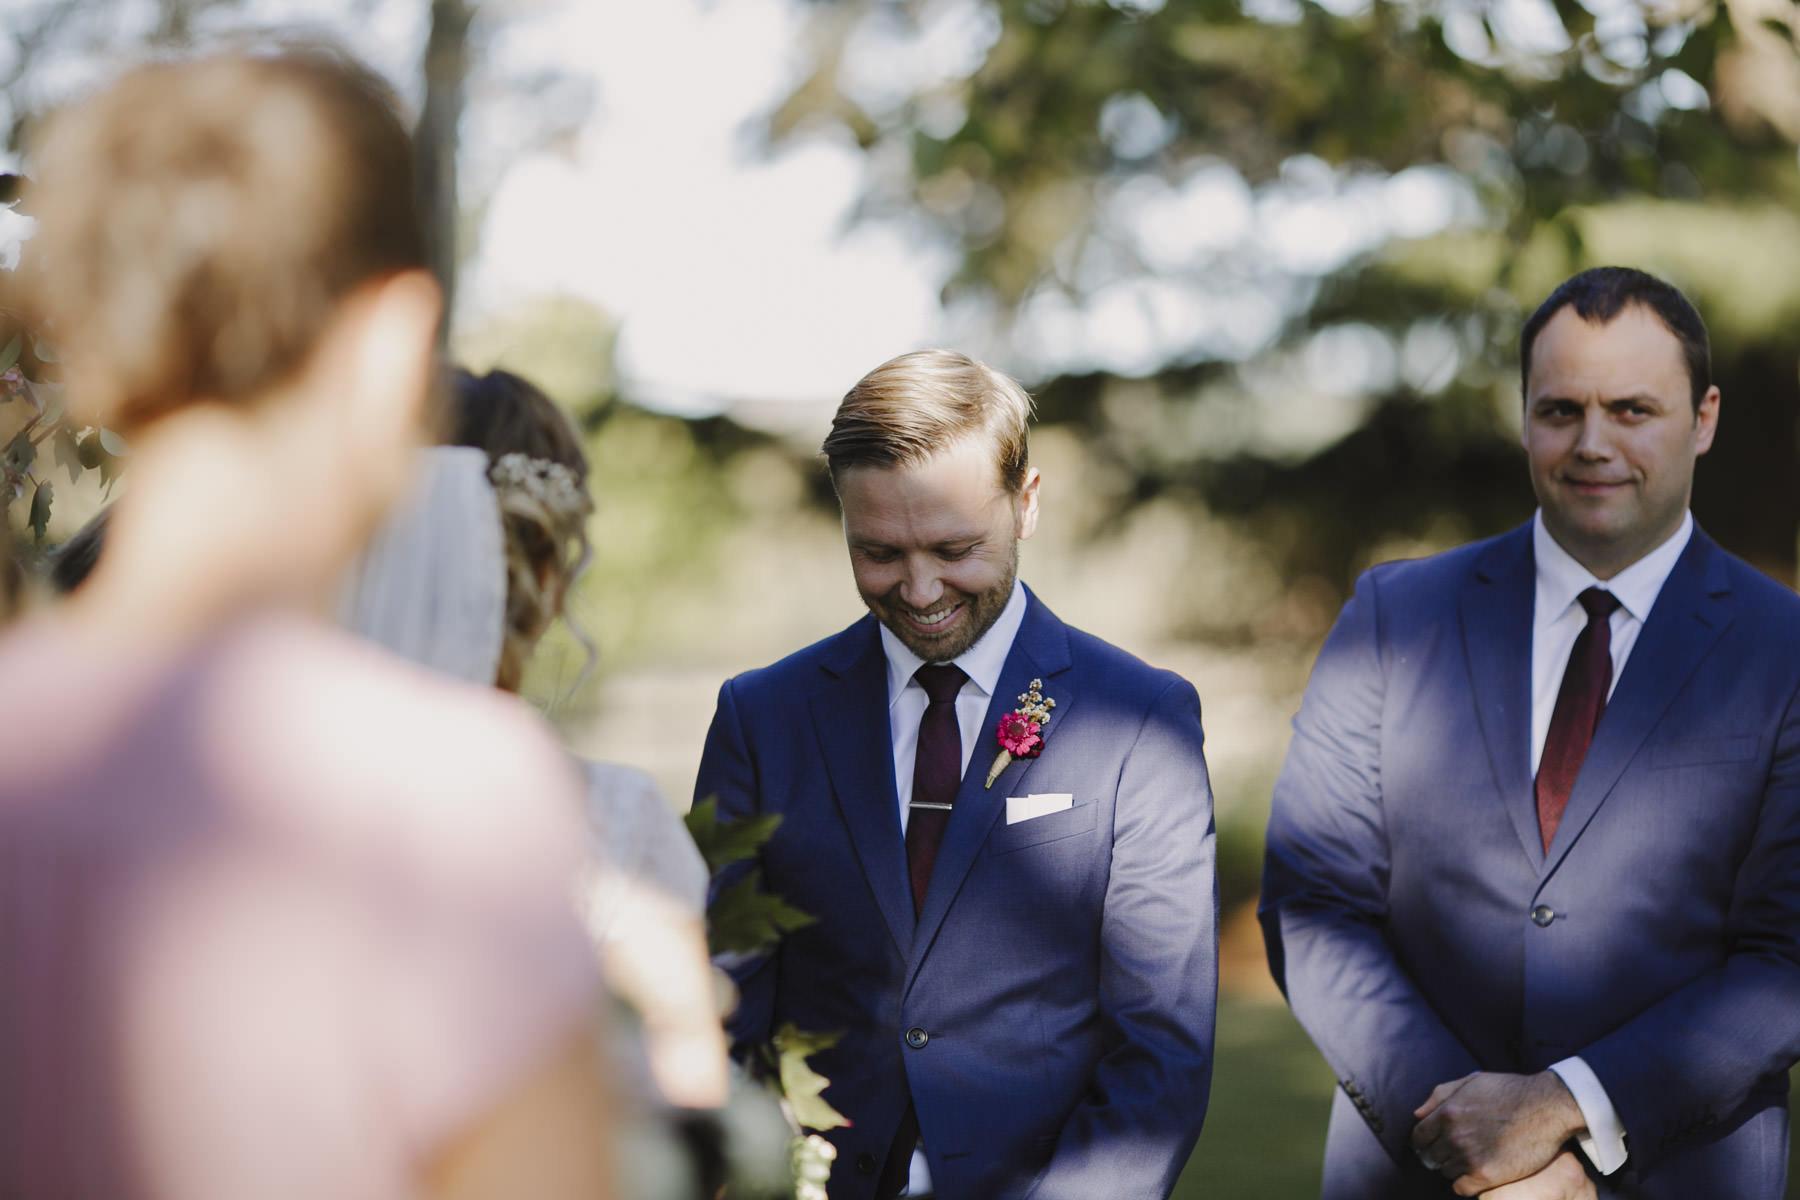 160506_justinaaron_wedding_holly_daniel_pr-93.jpg